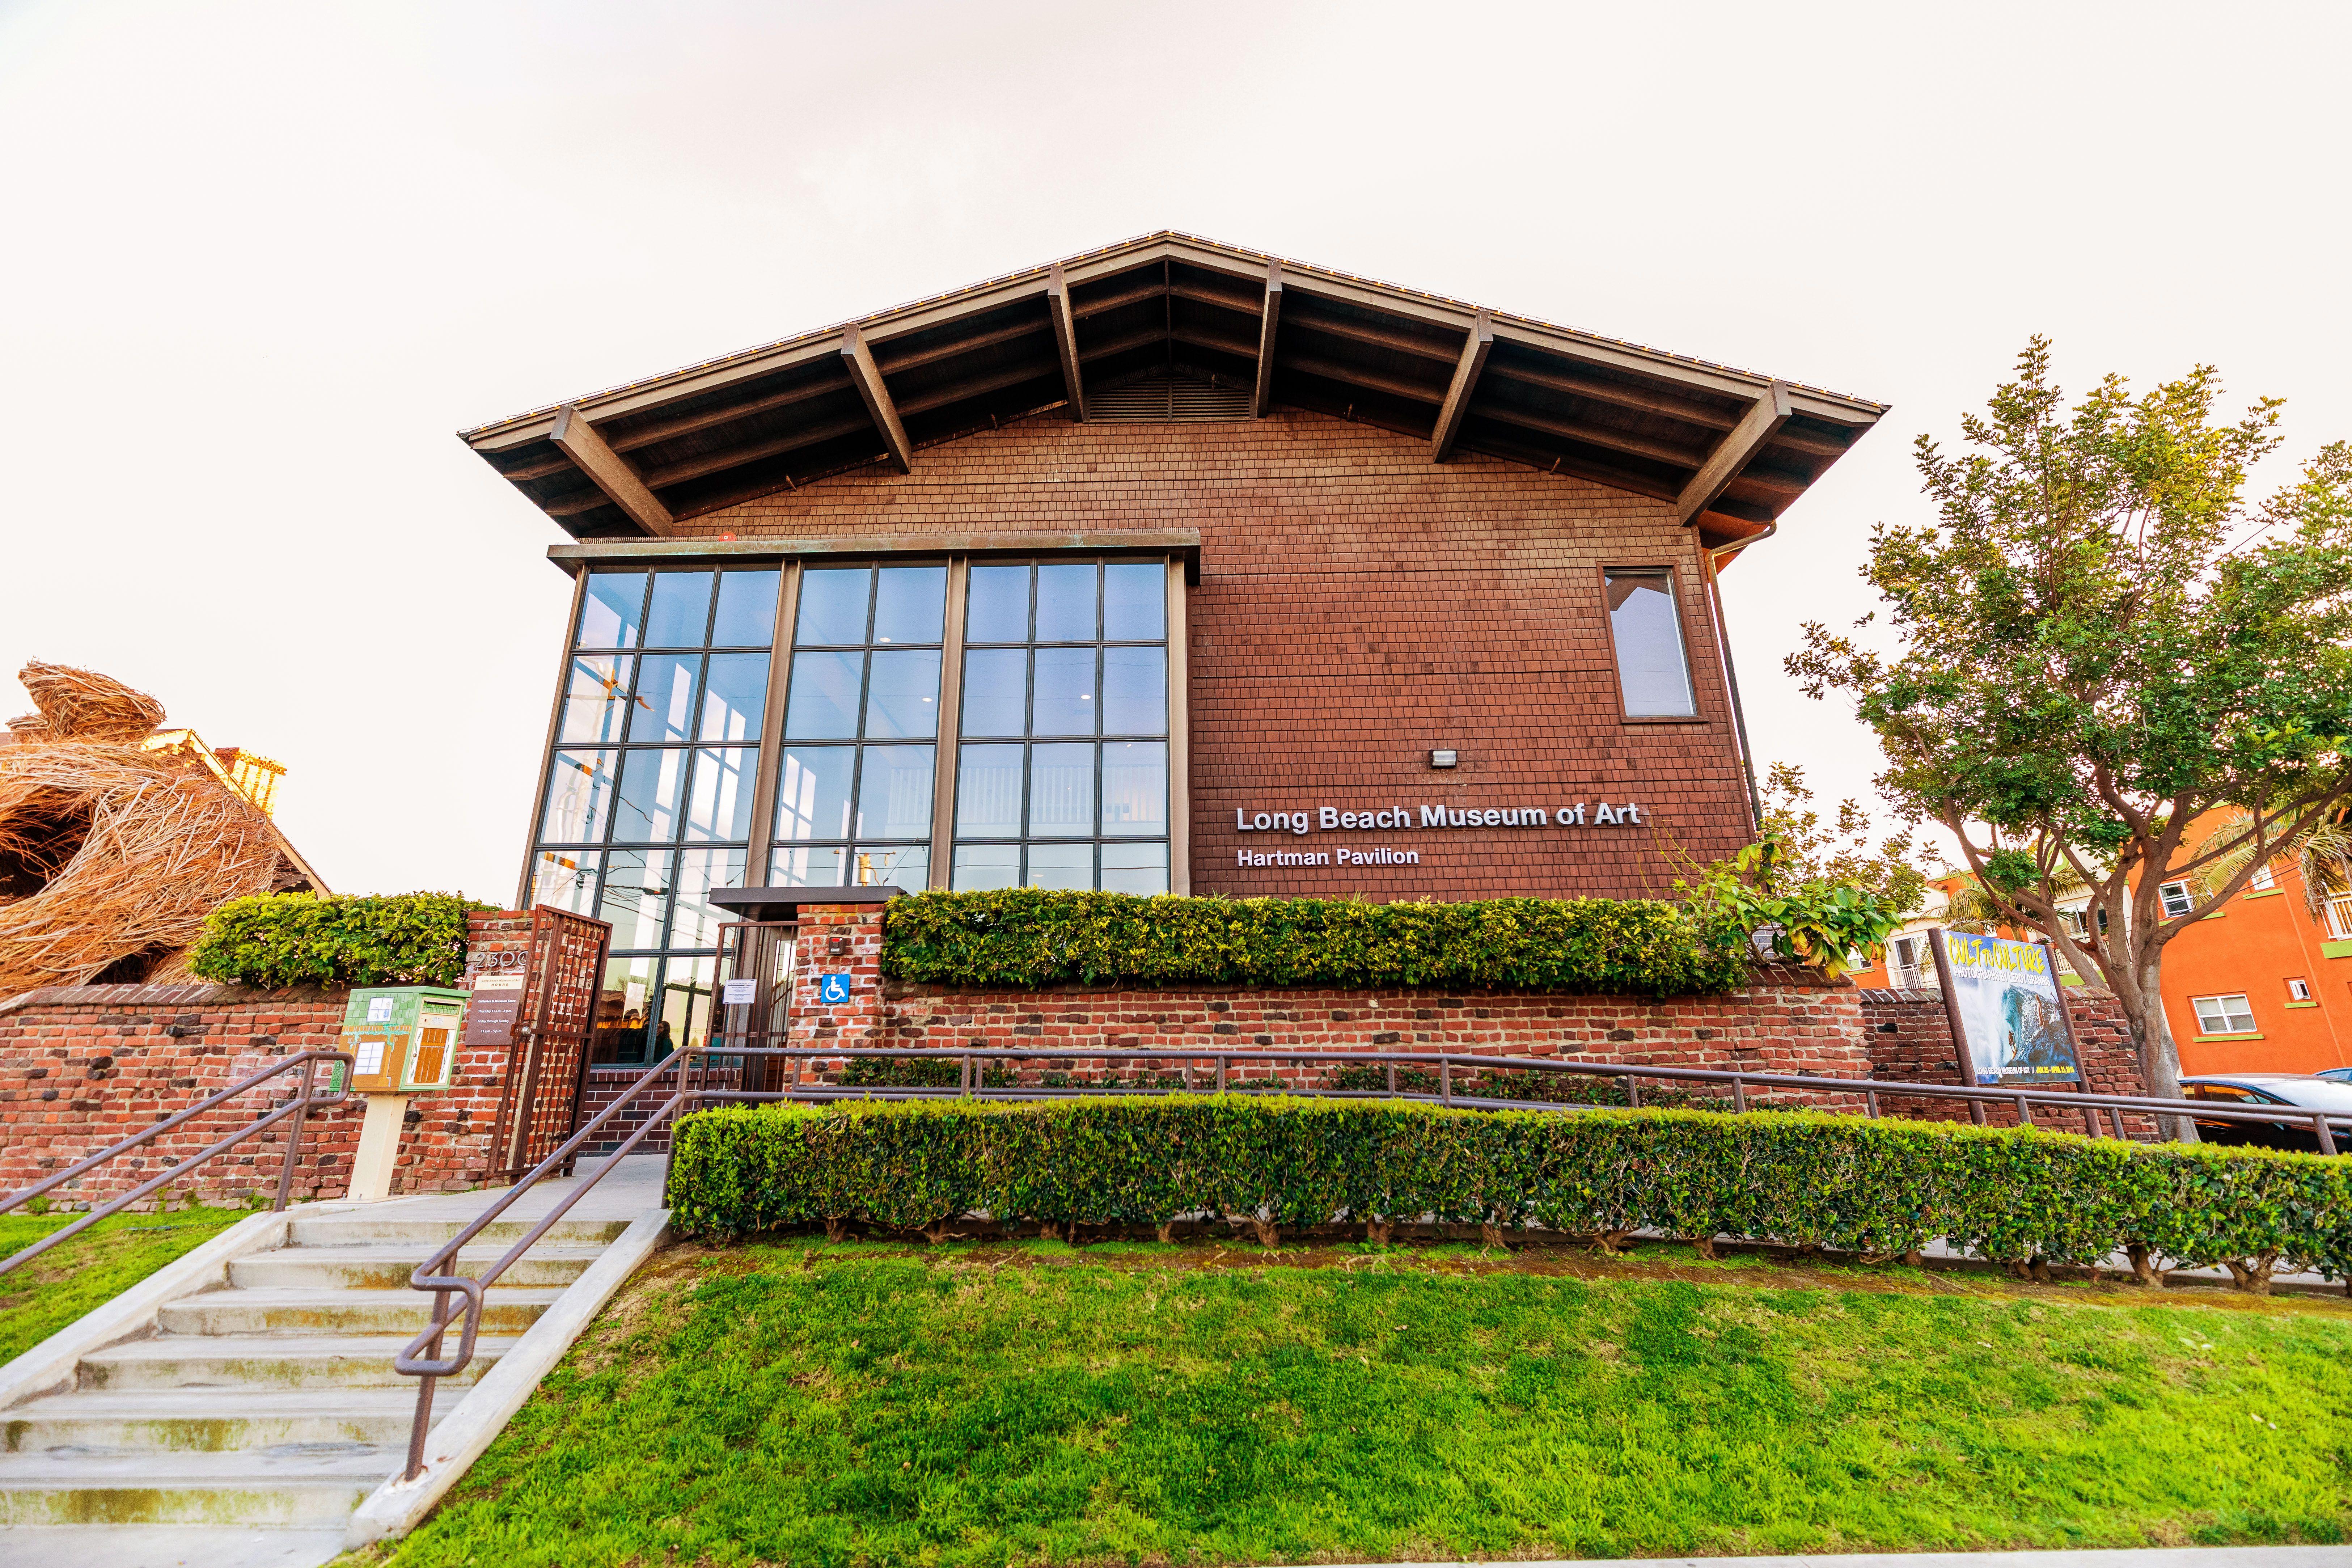 Exterior of the Long Beach Museum of Art